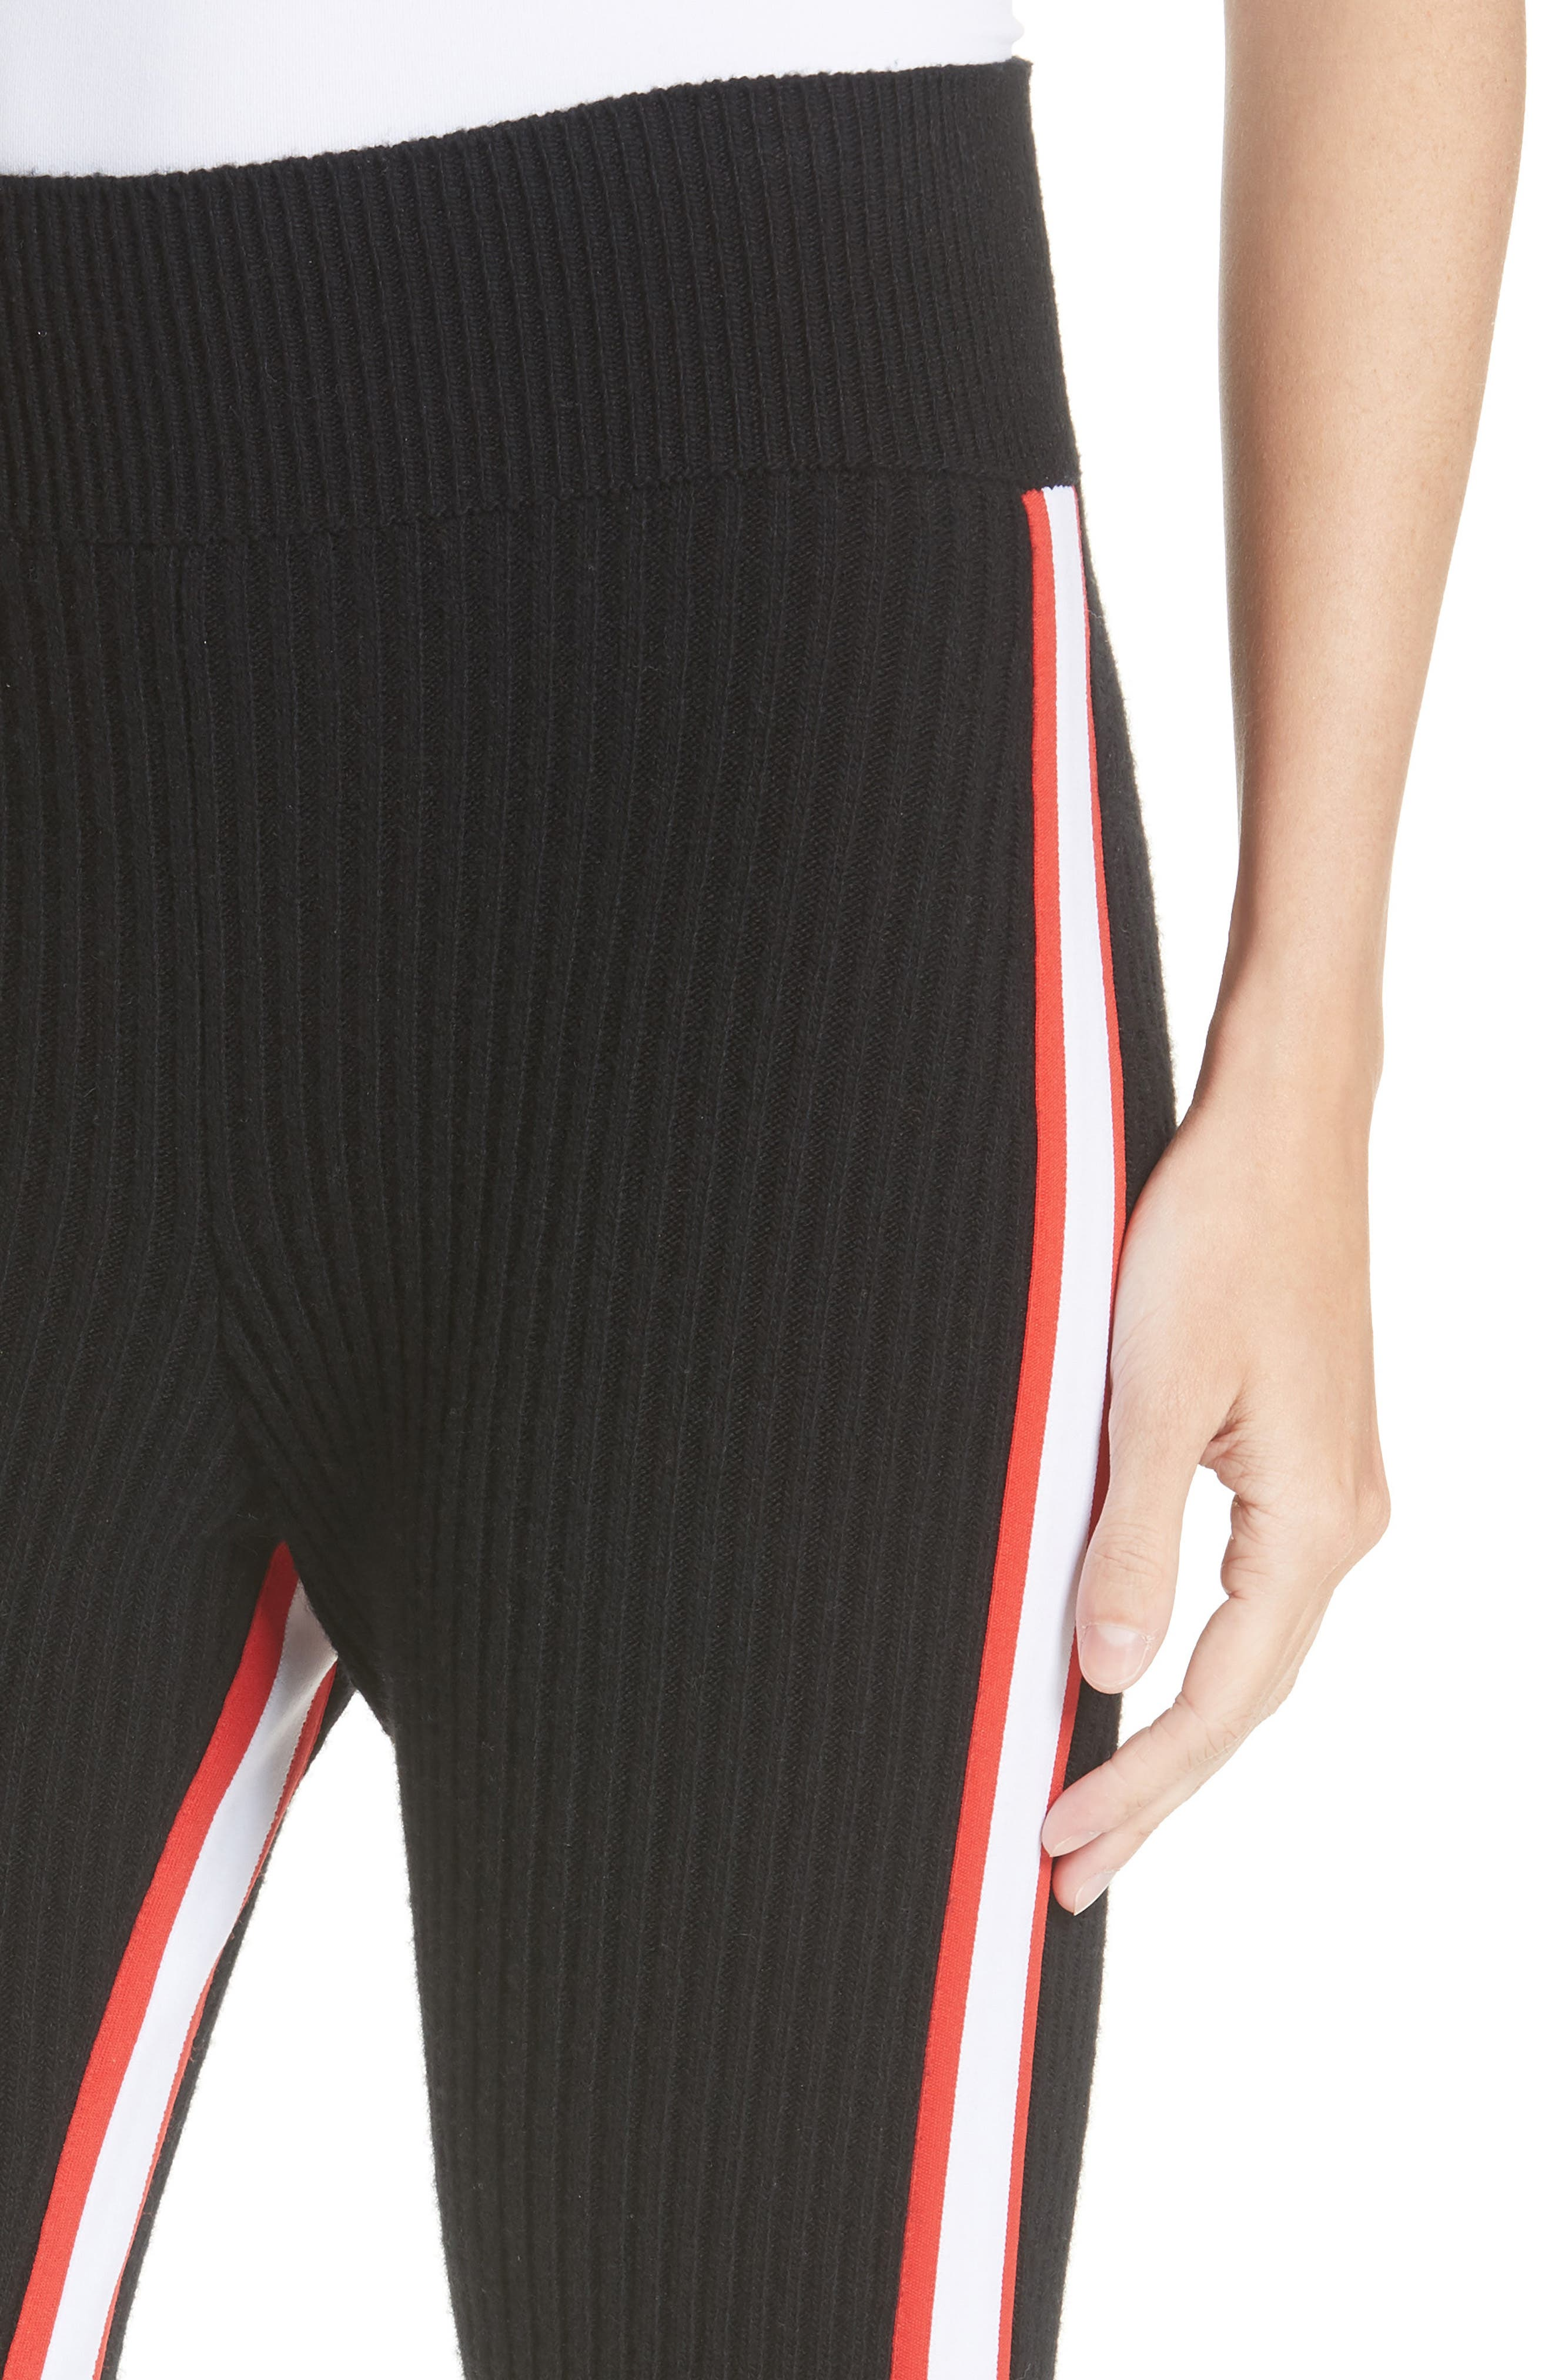 CALVIN KLEIN 205W39NYC,                             Side Stripe Stretch Wool Stirrup Leggings,                             Alternate thumbnail 4, color,                             001